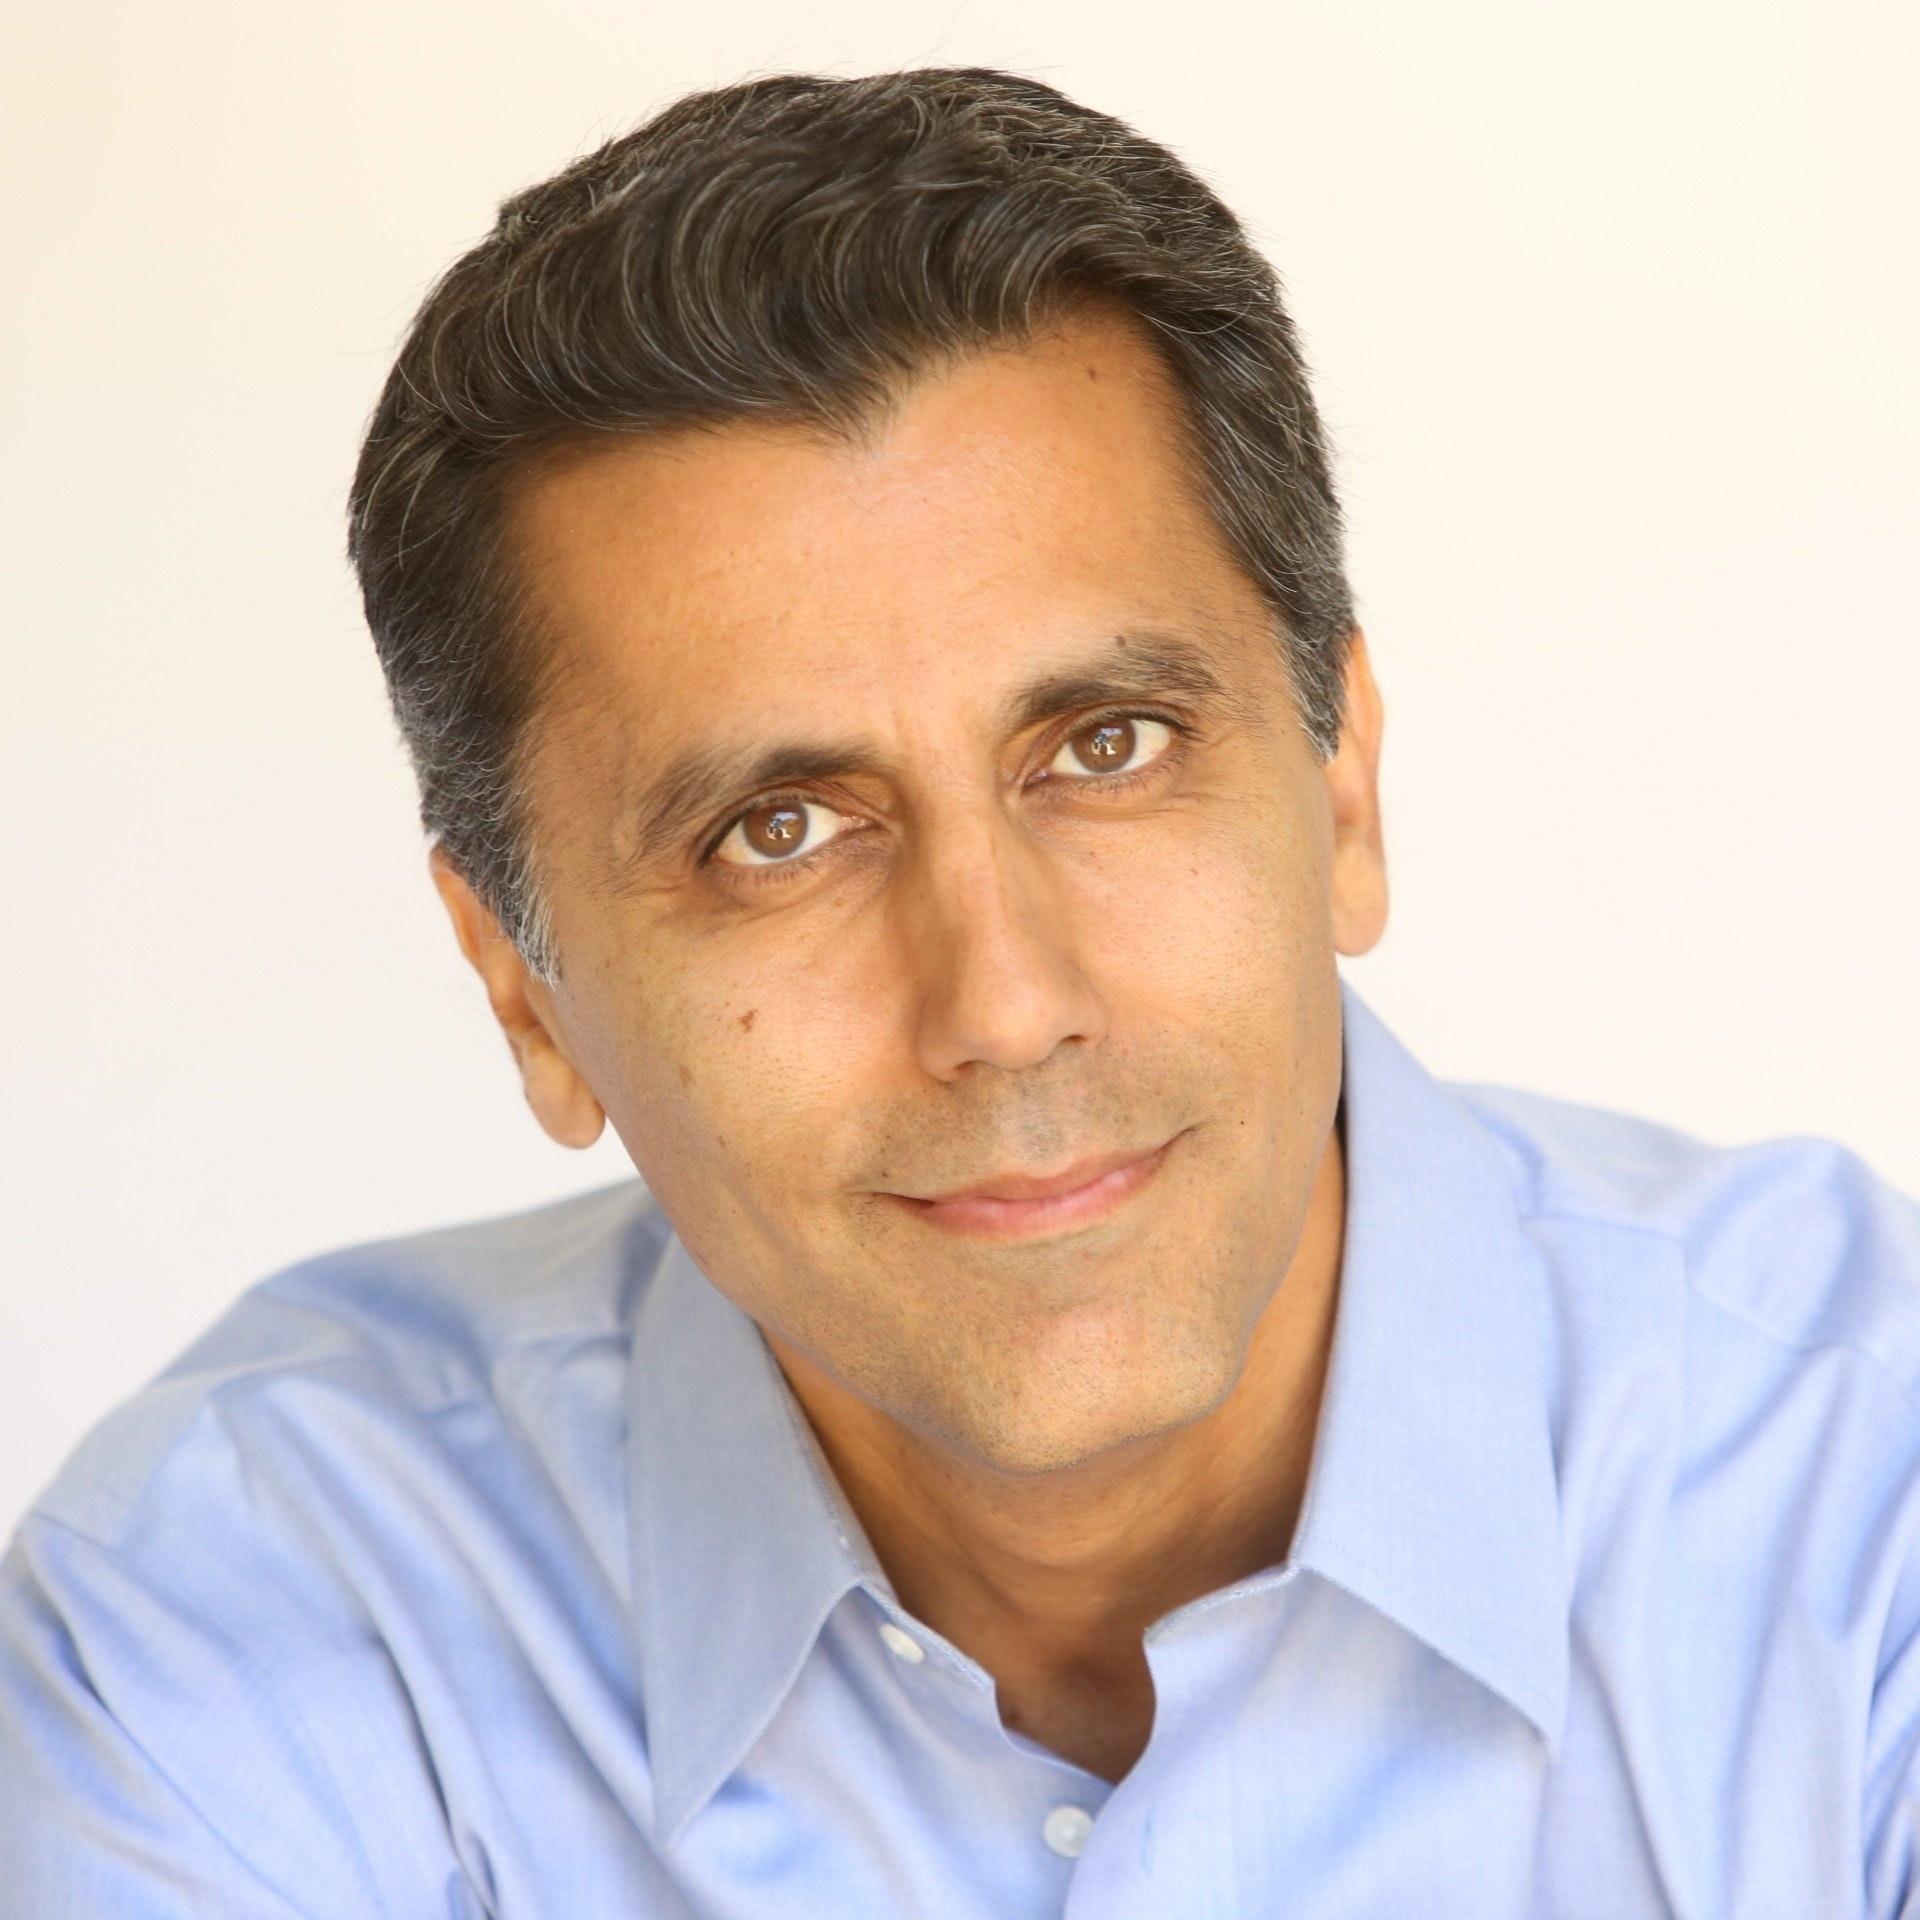 Reza Raji